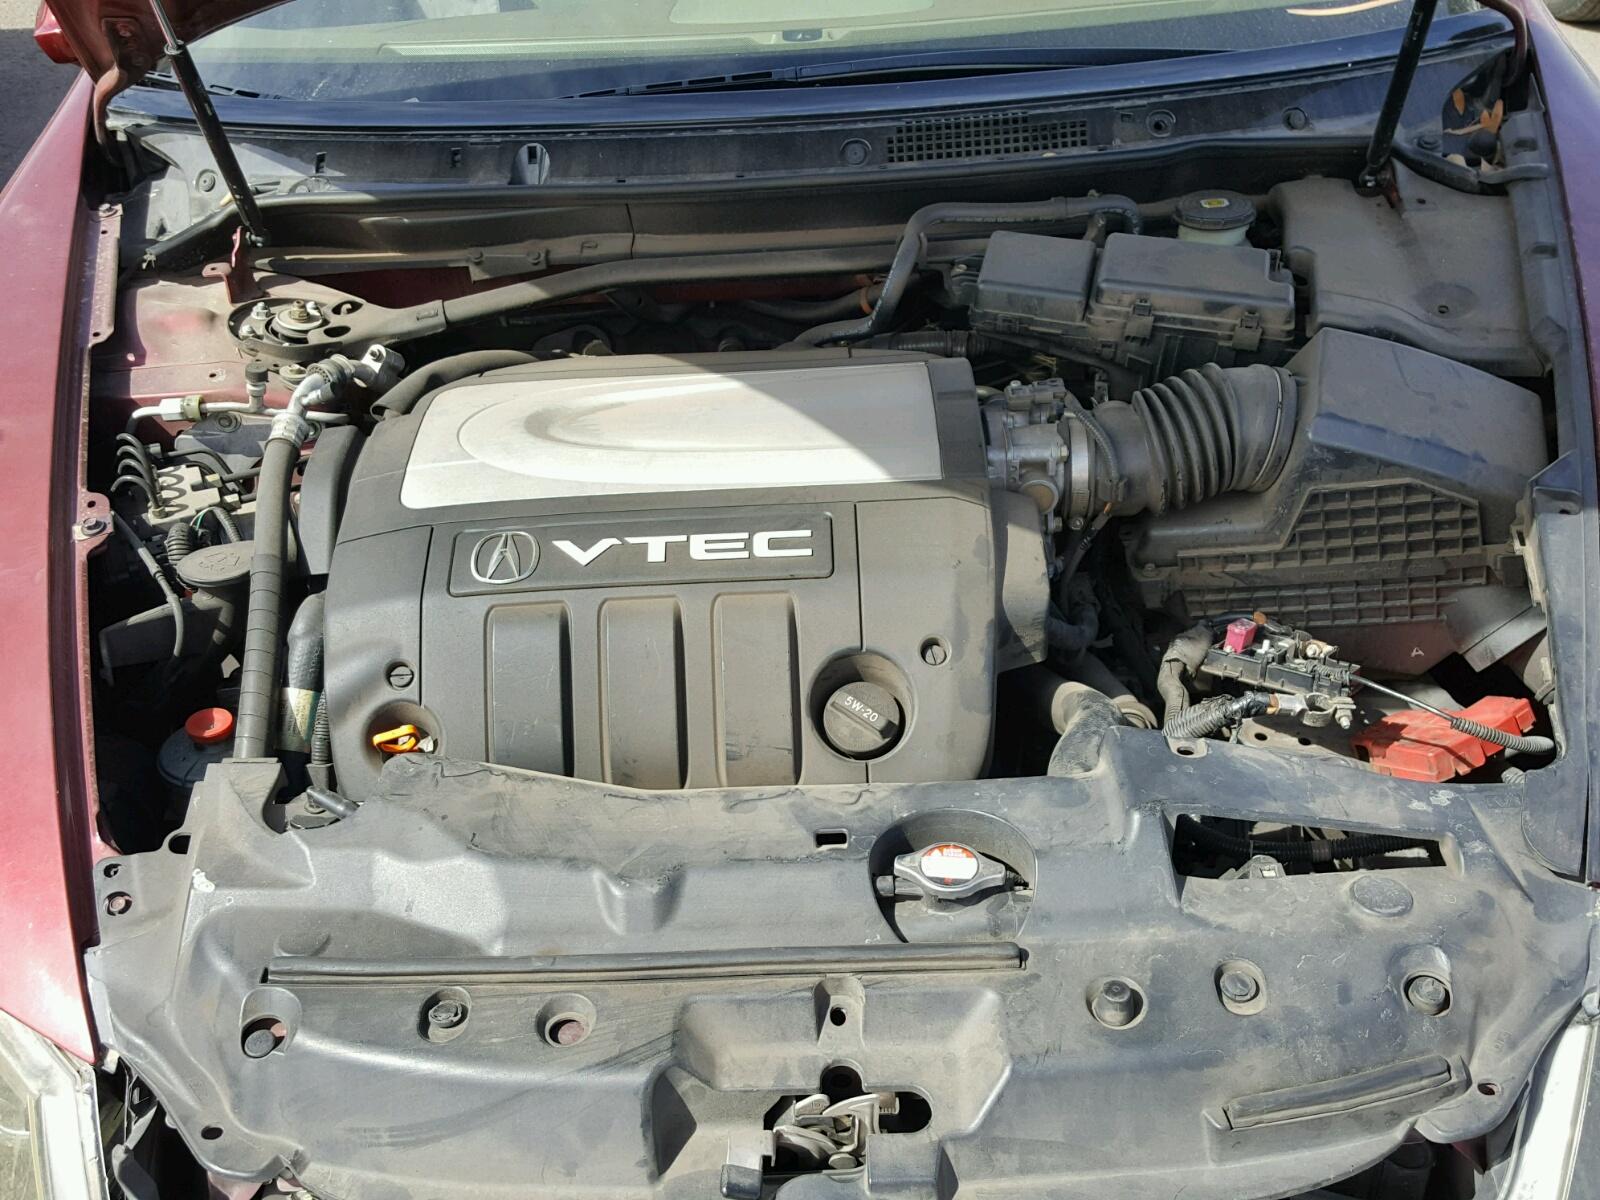 JHKBC RED ACURA RL On Sale In AZ PHOENIX Lot - 2005 acura rl engine